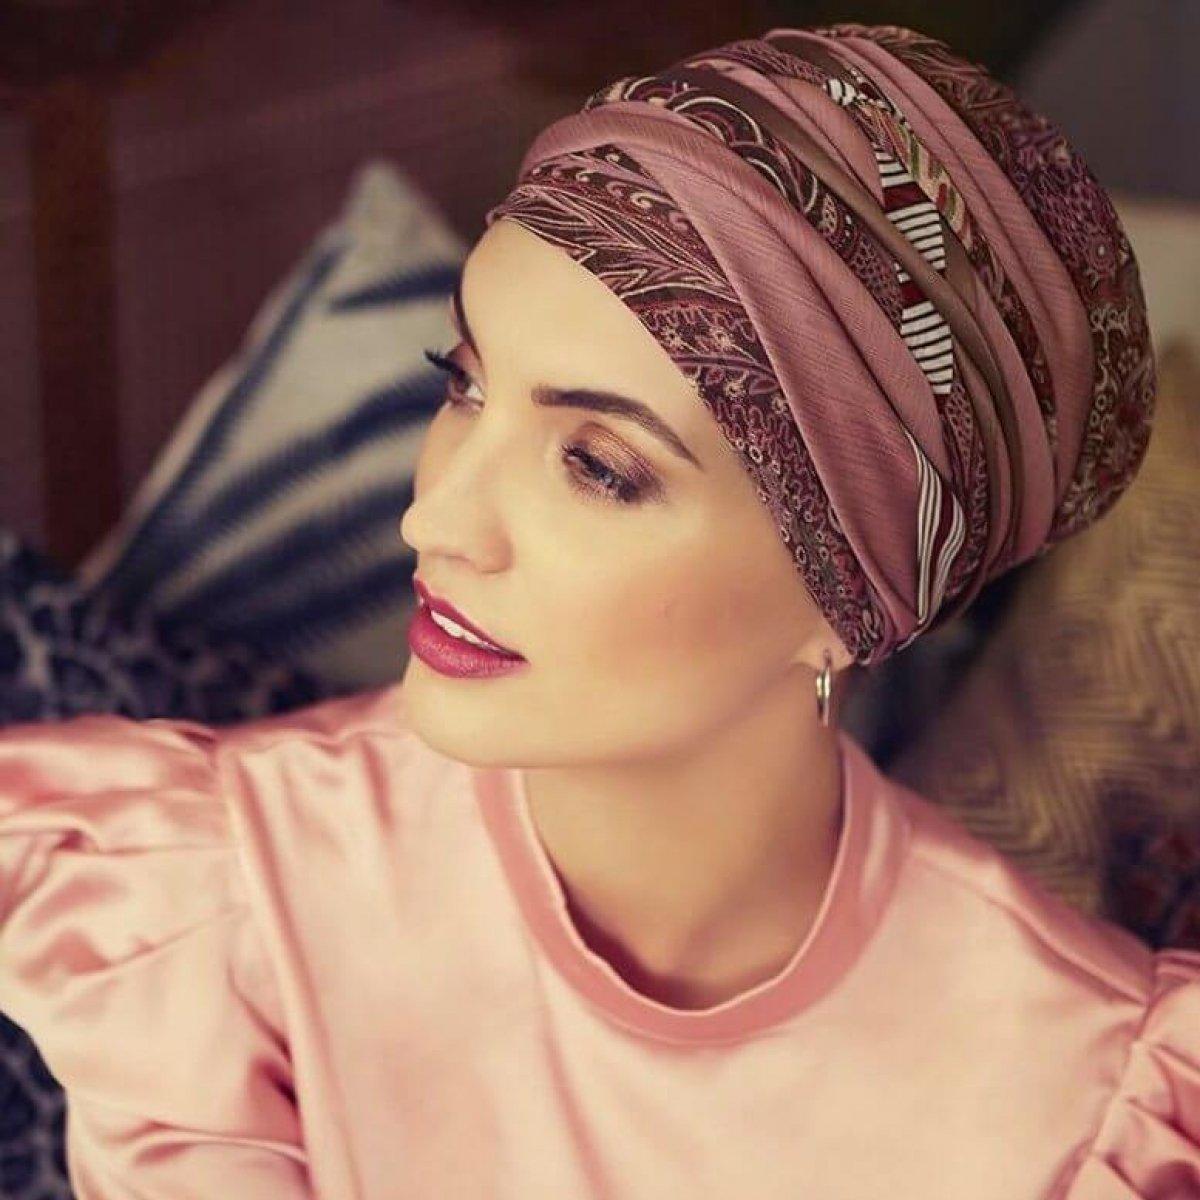 turbans chimiothérapies féminins à Nantes 44